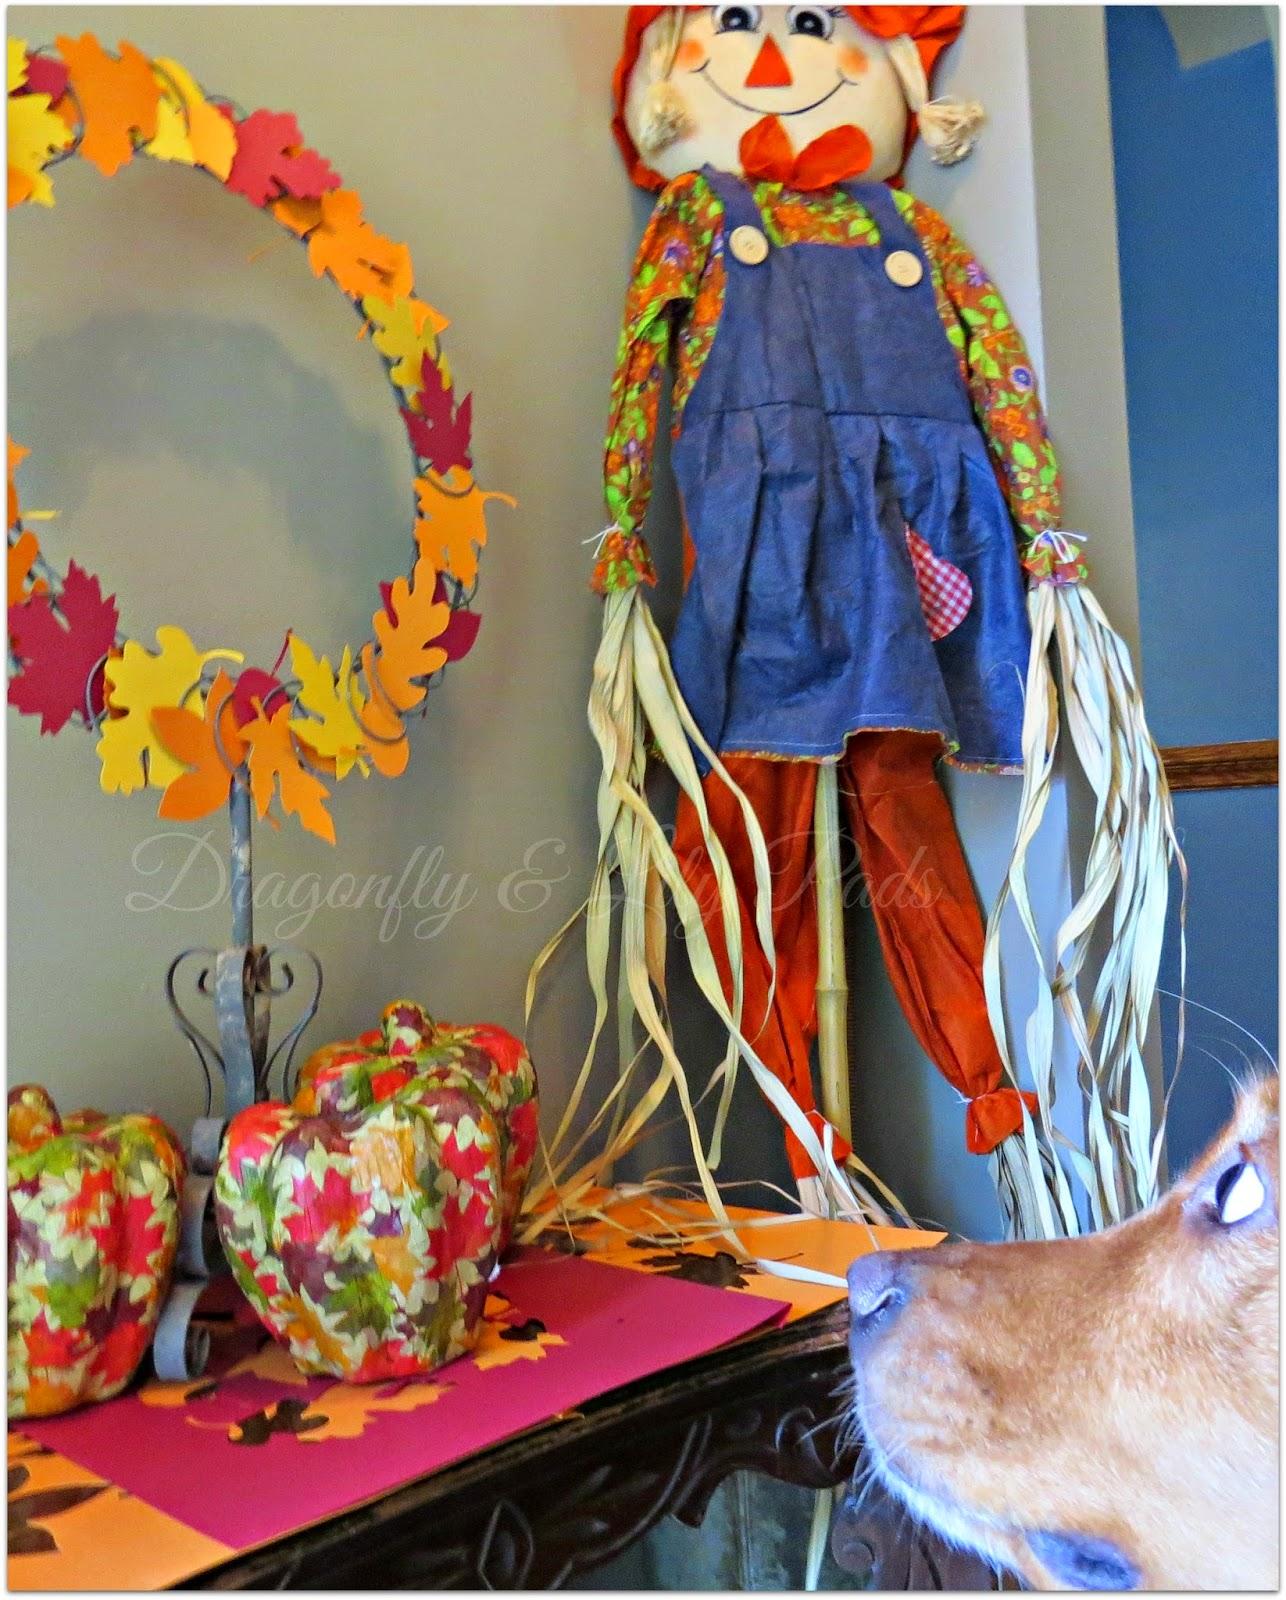 Close up of Cricket, Golden Retriever, Fall silhouette wreath, modge podge pumpkins, scarecrow, Fall Welcome decor, handmade on Shabby table